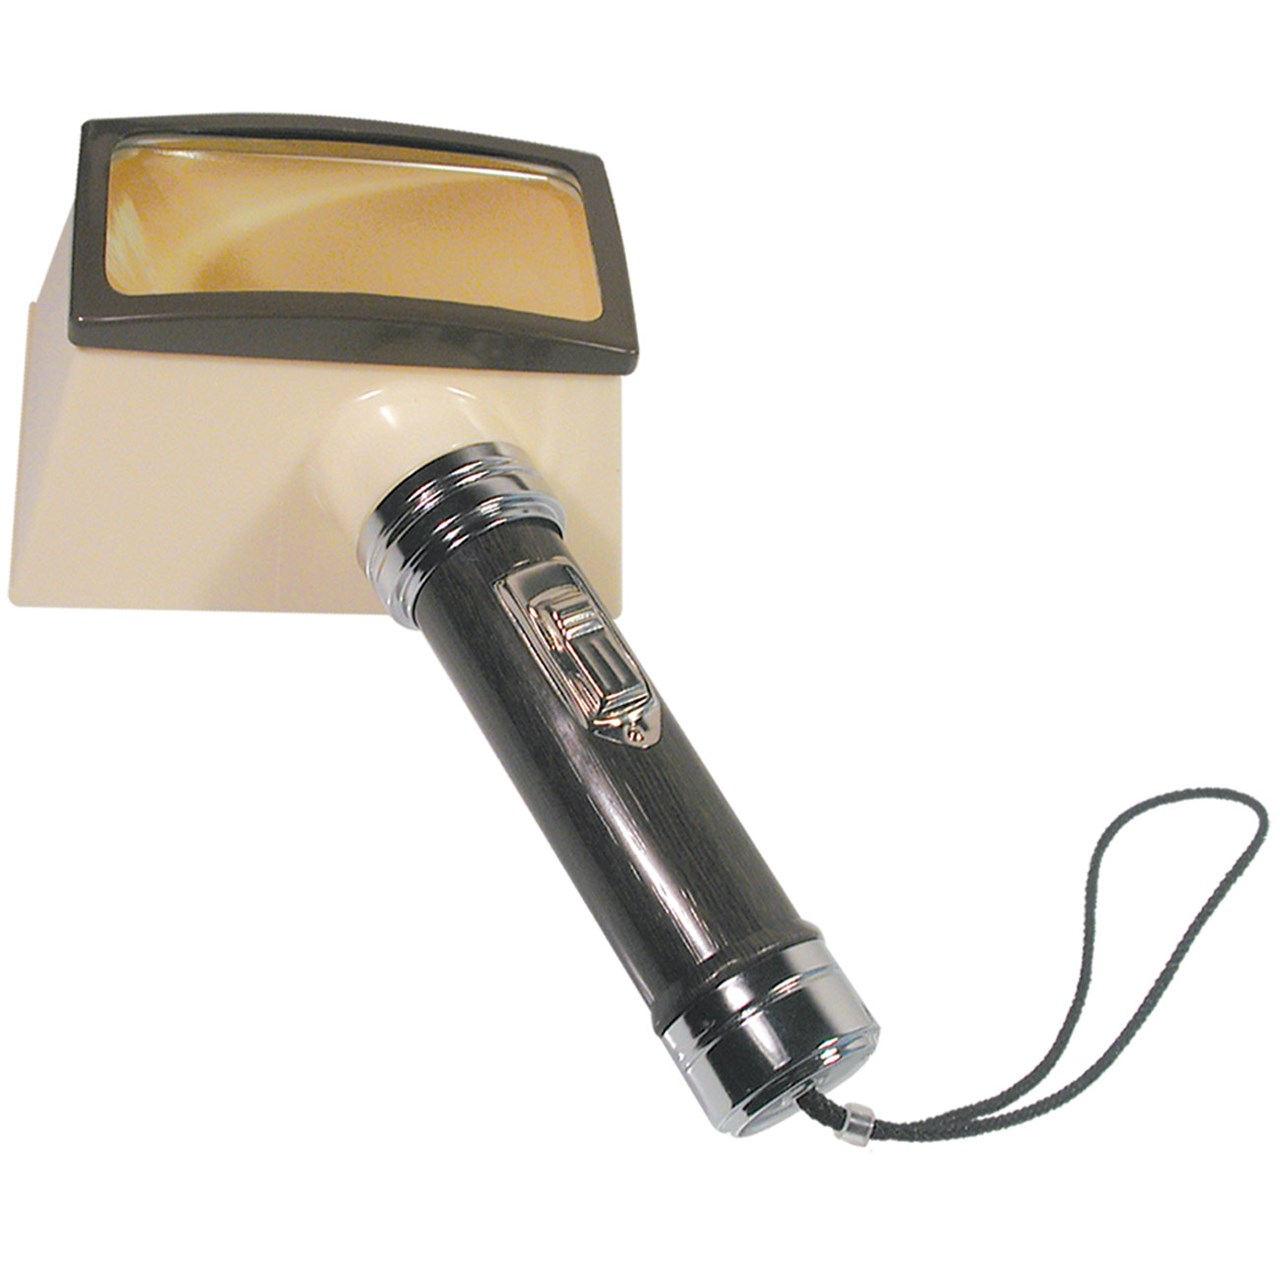 REIZEN Stand Magnifier - 2.5X